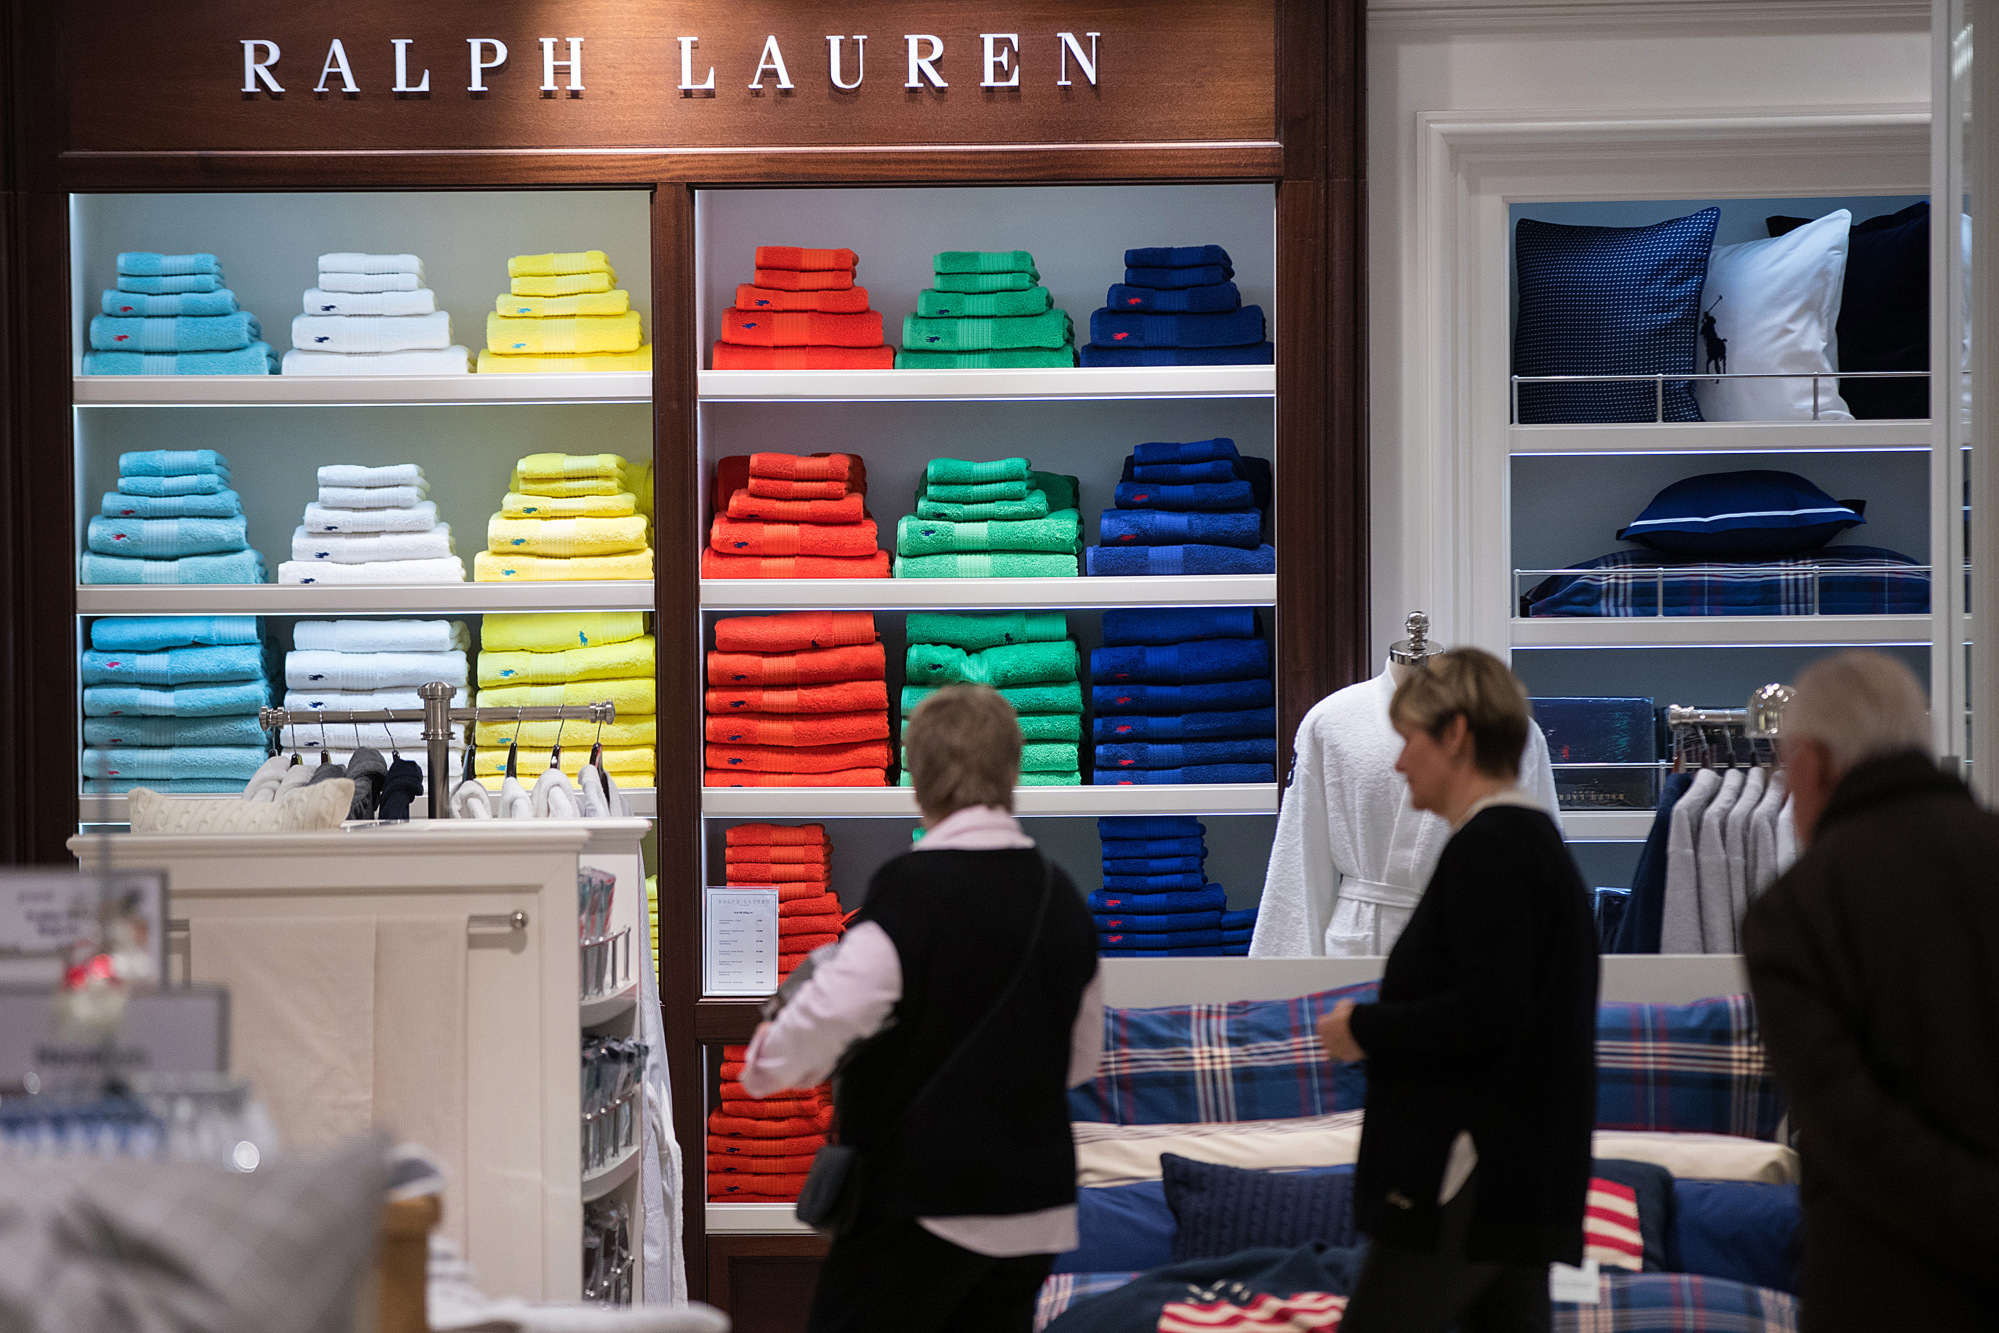 Ralph Lauren Shares Surge on Designer s Vote of Confidence in His CEO -  Bloomberg 277c4ec6c170